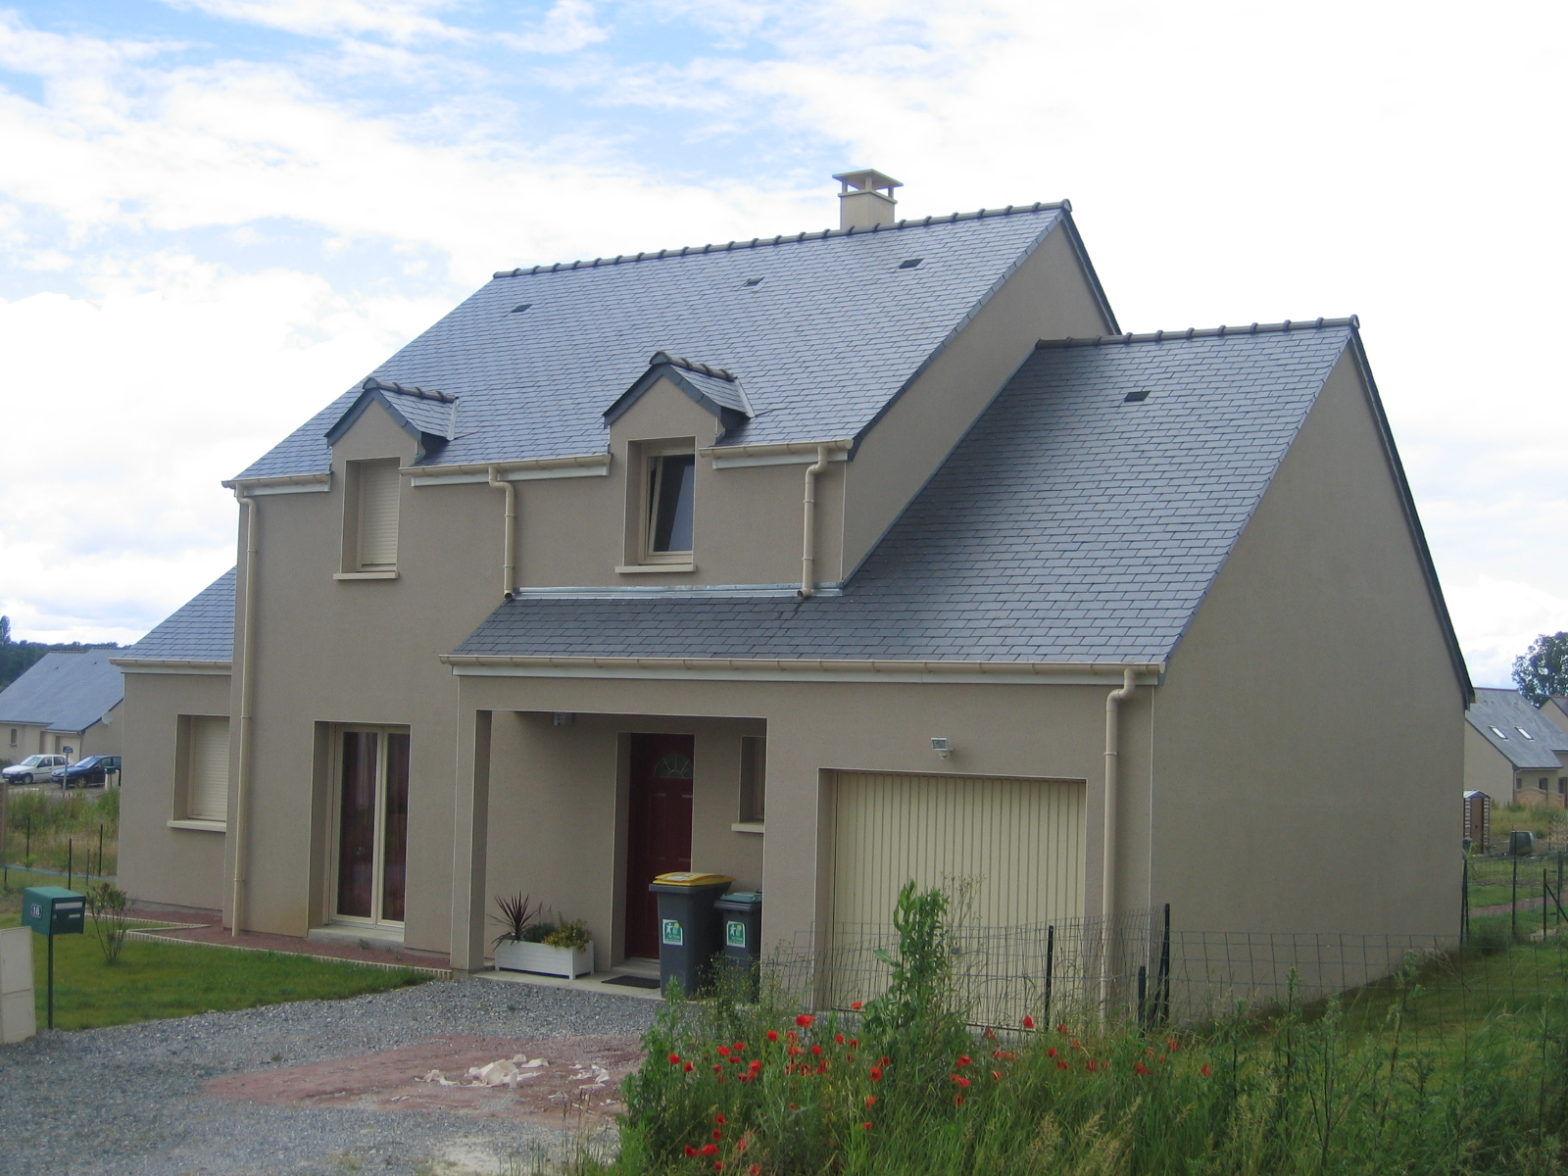 maison etage comble toiture ardoise sarrigne 49